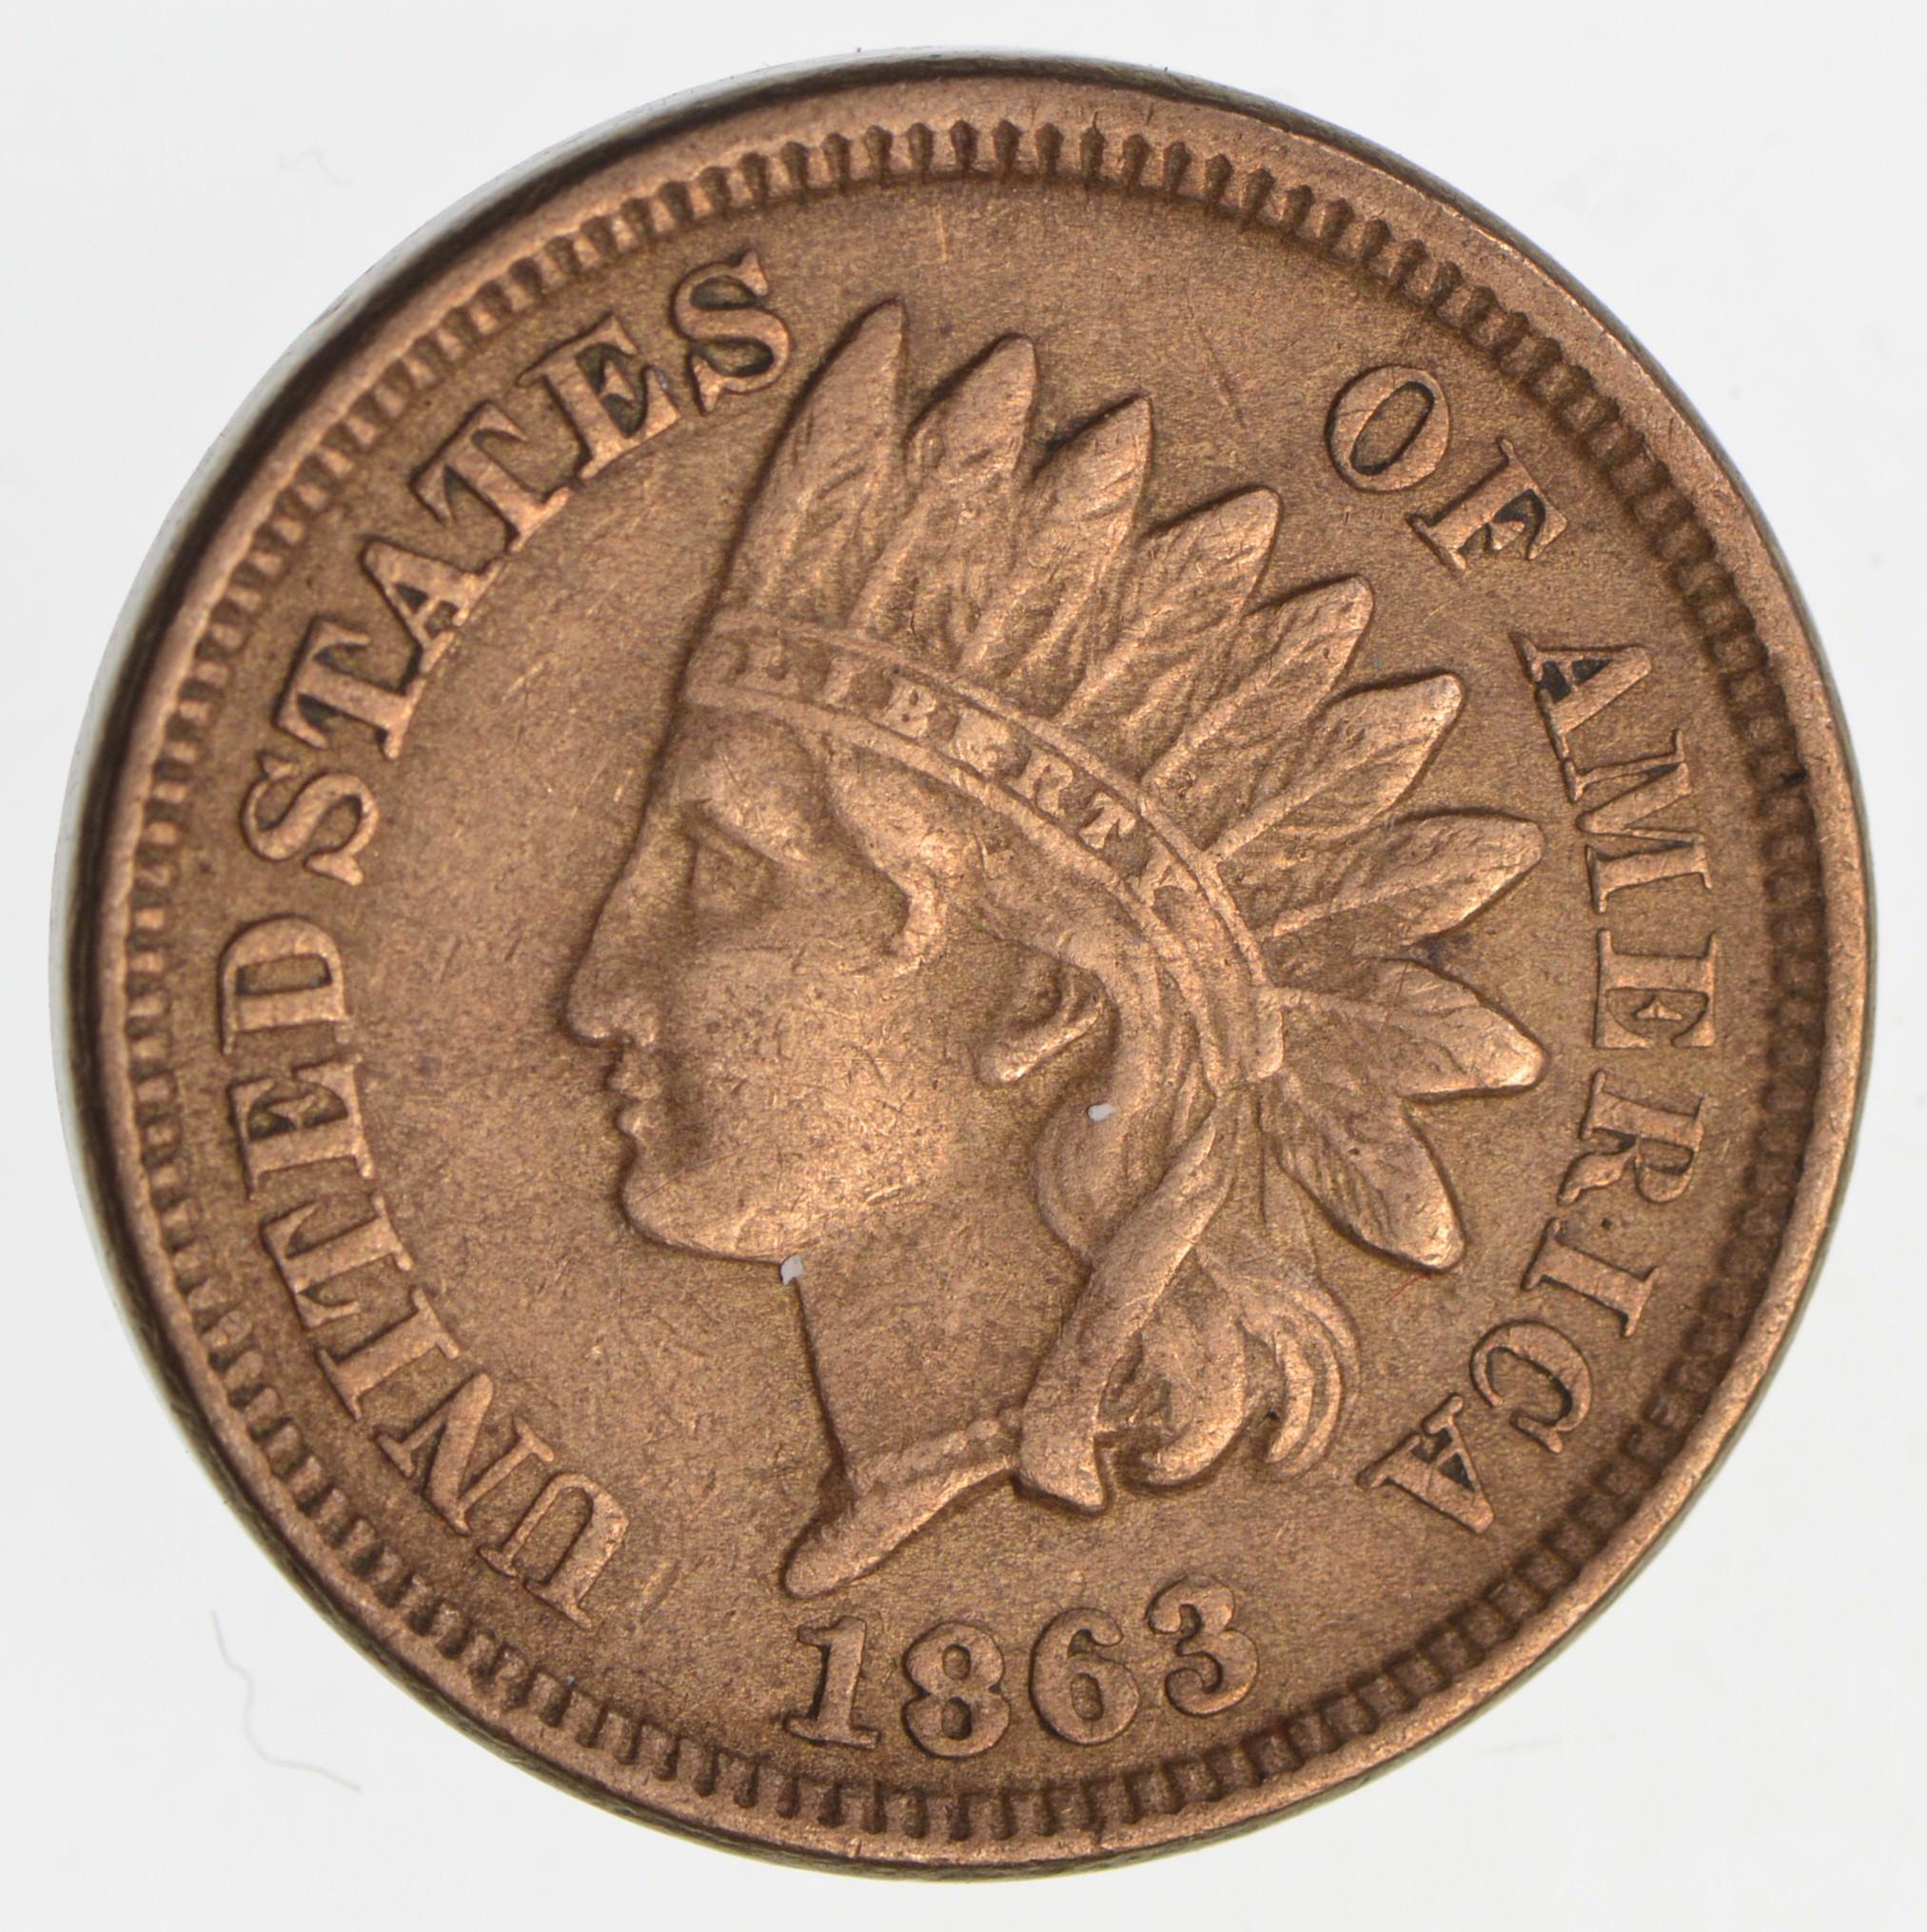 1 Ounce .999 Copper Round Civil War 1863 Siege of Vicksburg 5 Coins